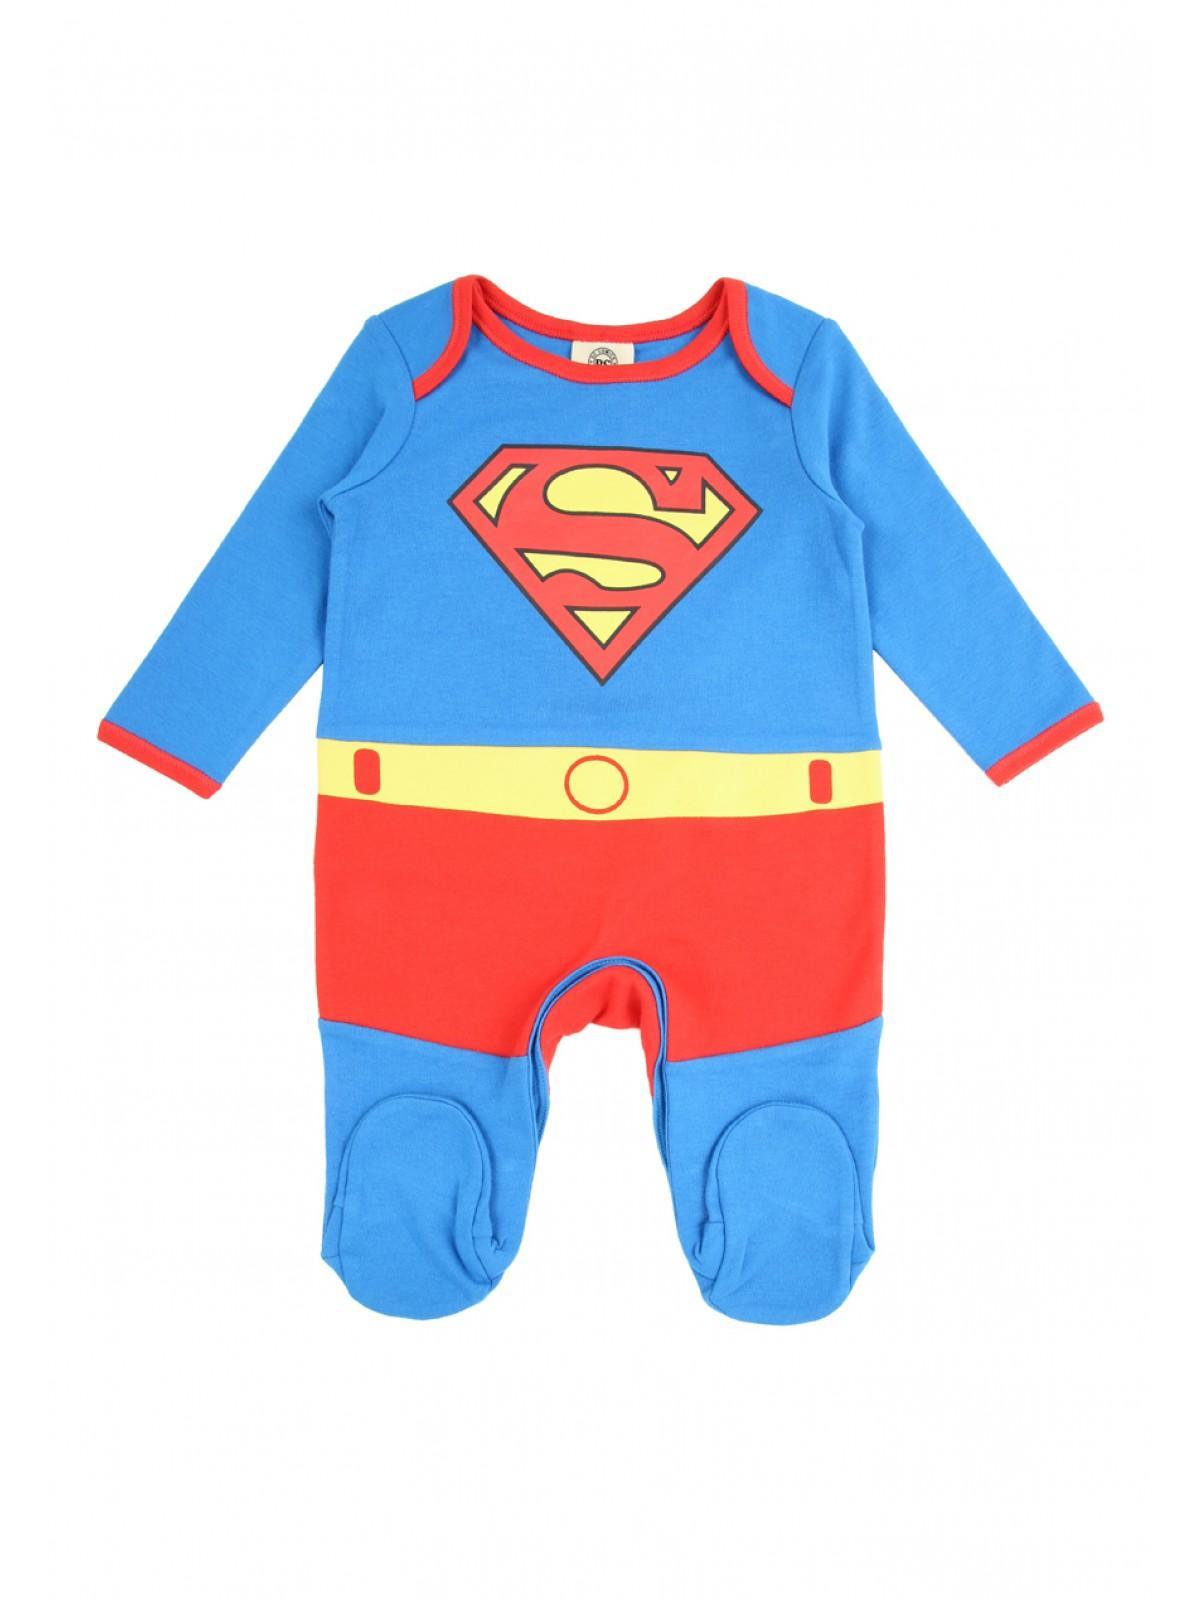 ccb1b89455f4 Boys aby Boy Superman Sleepsuit